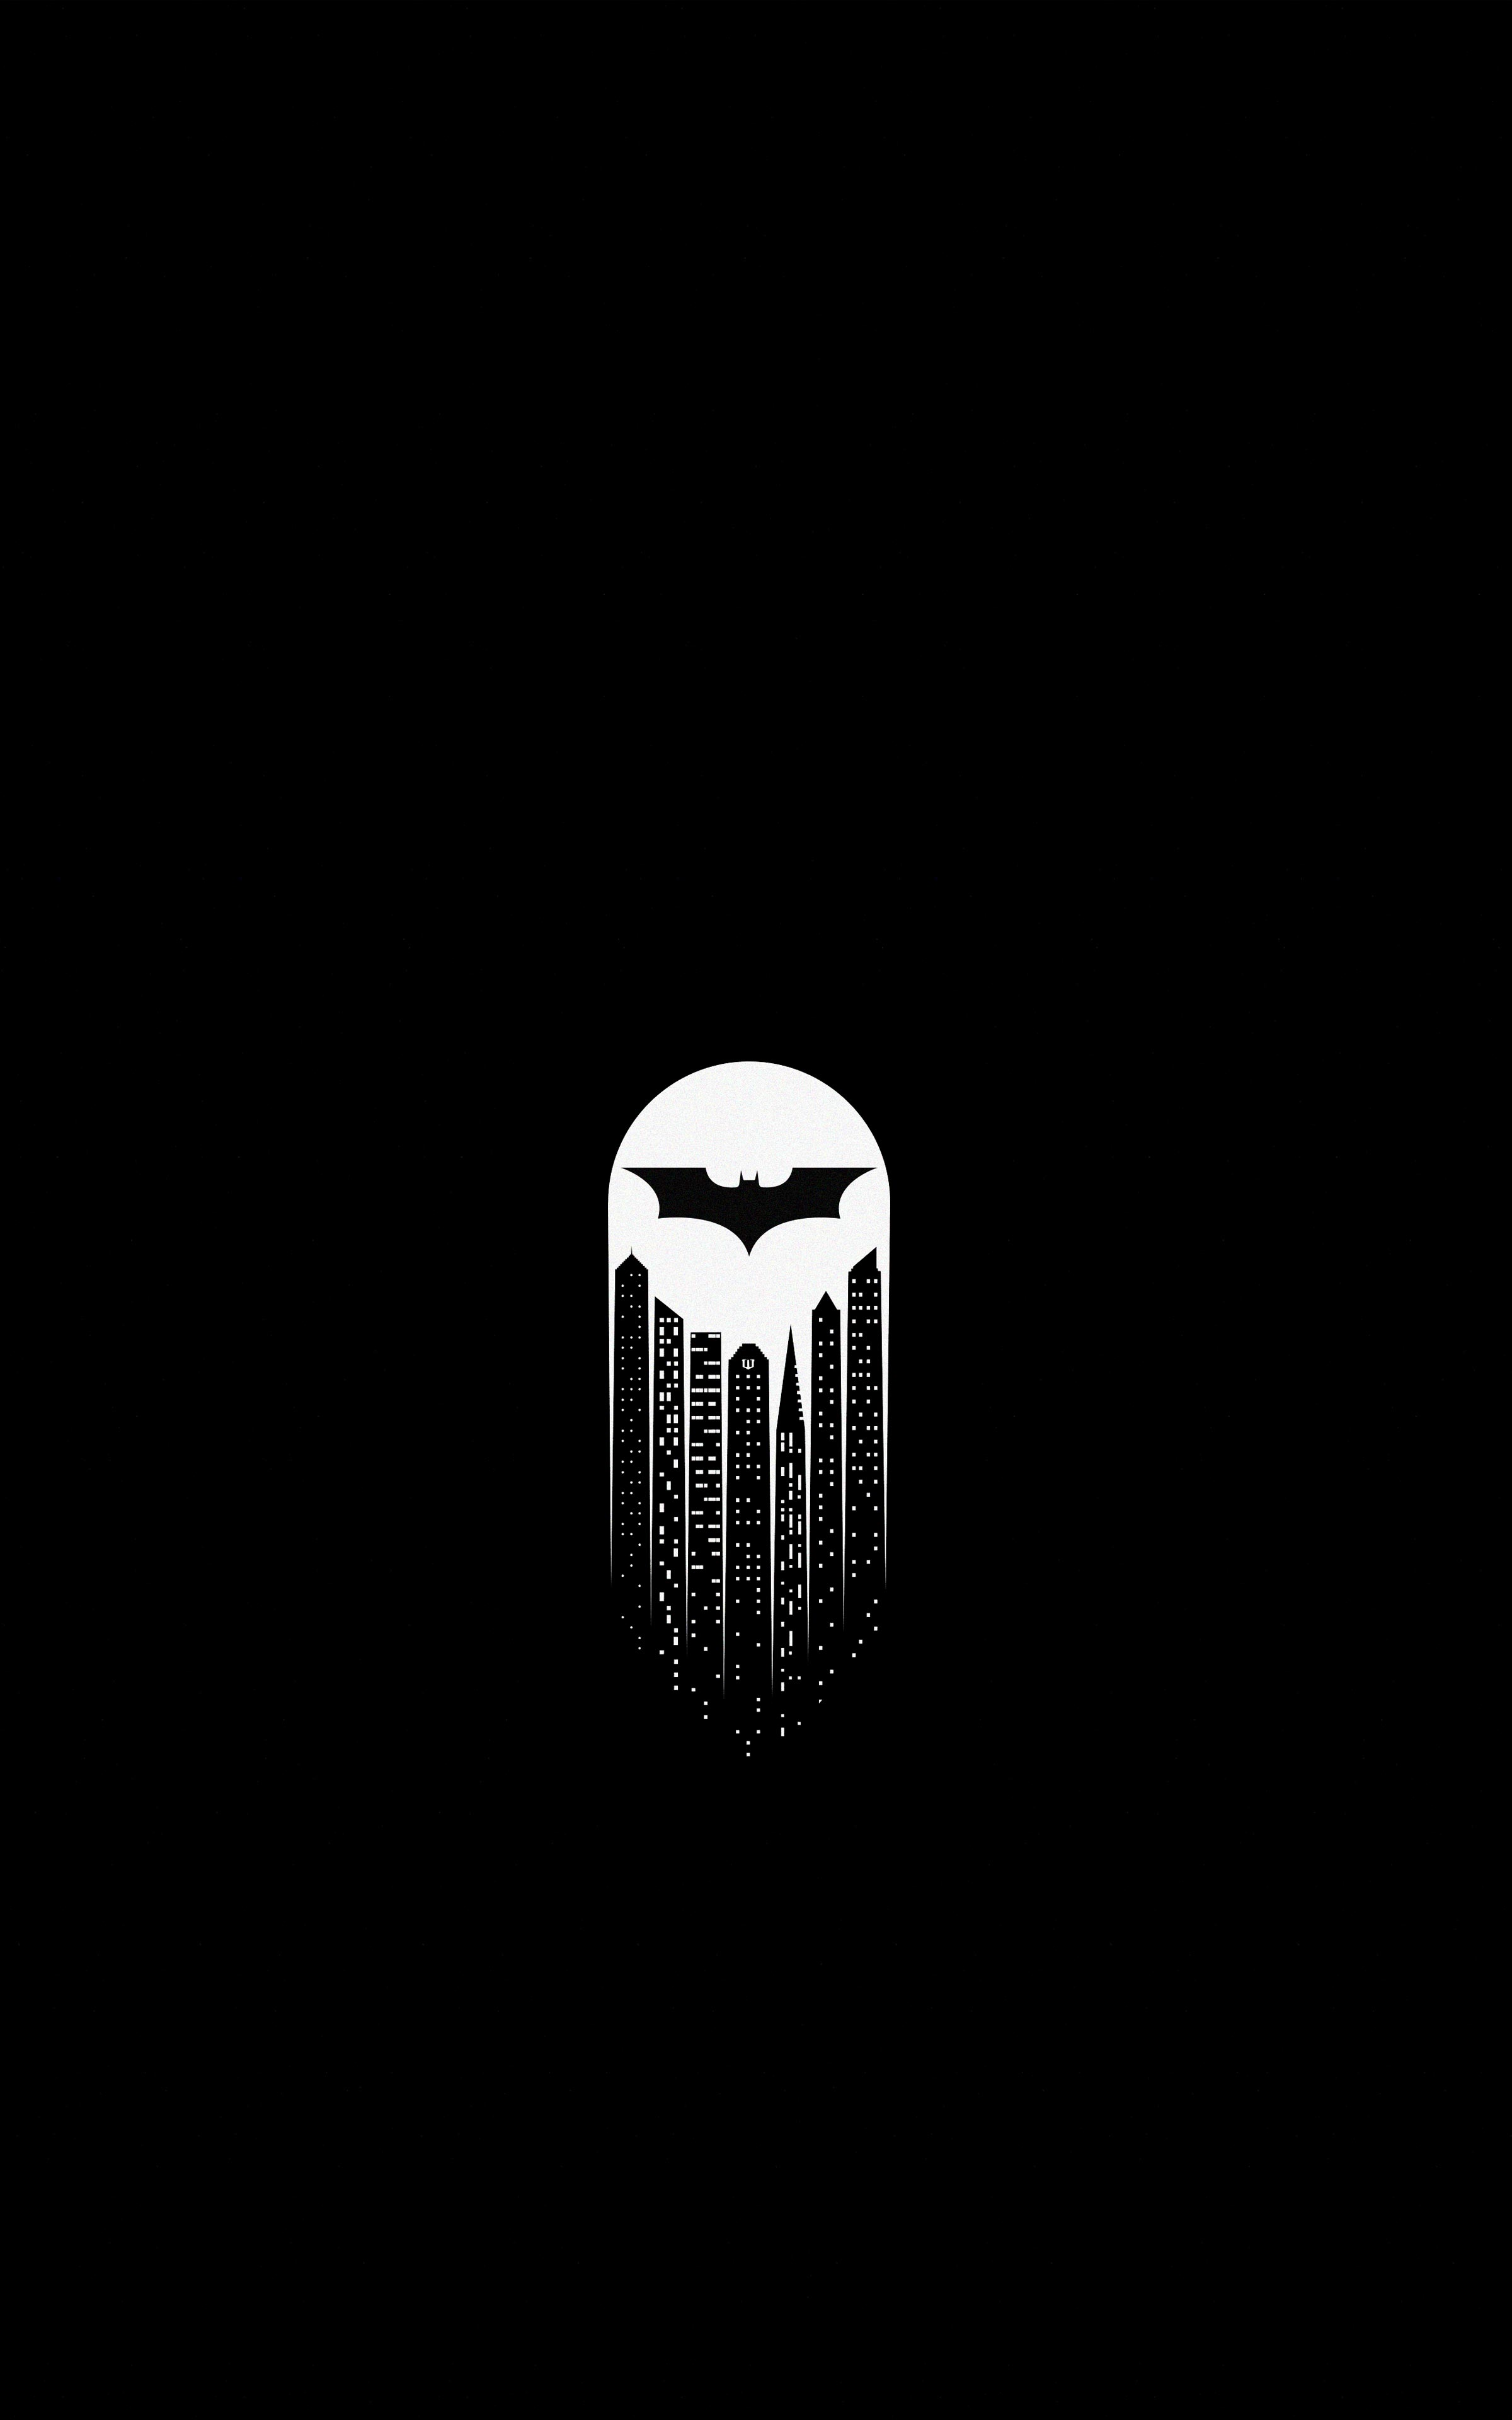 Gotham City Mobile Wallpaper